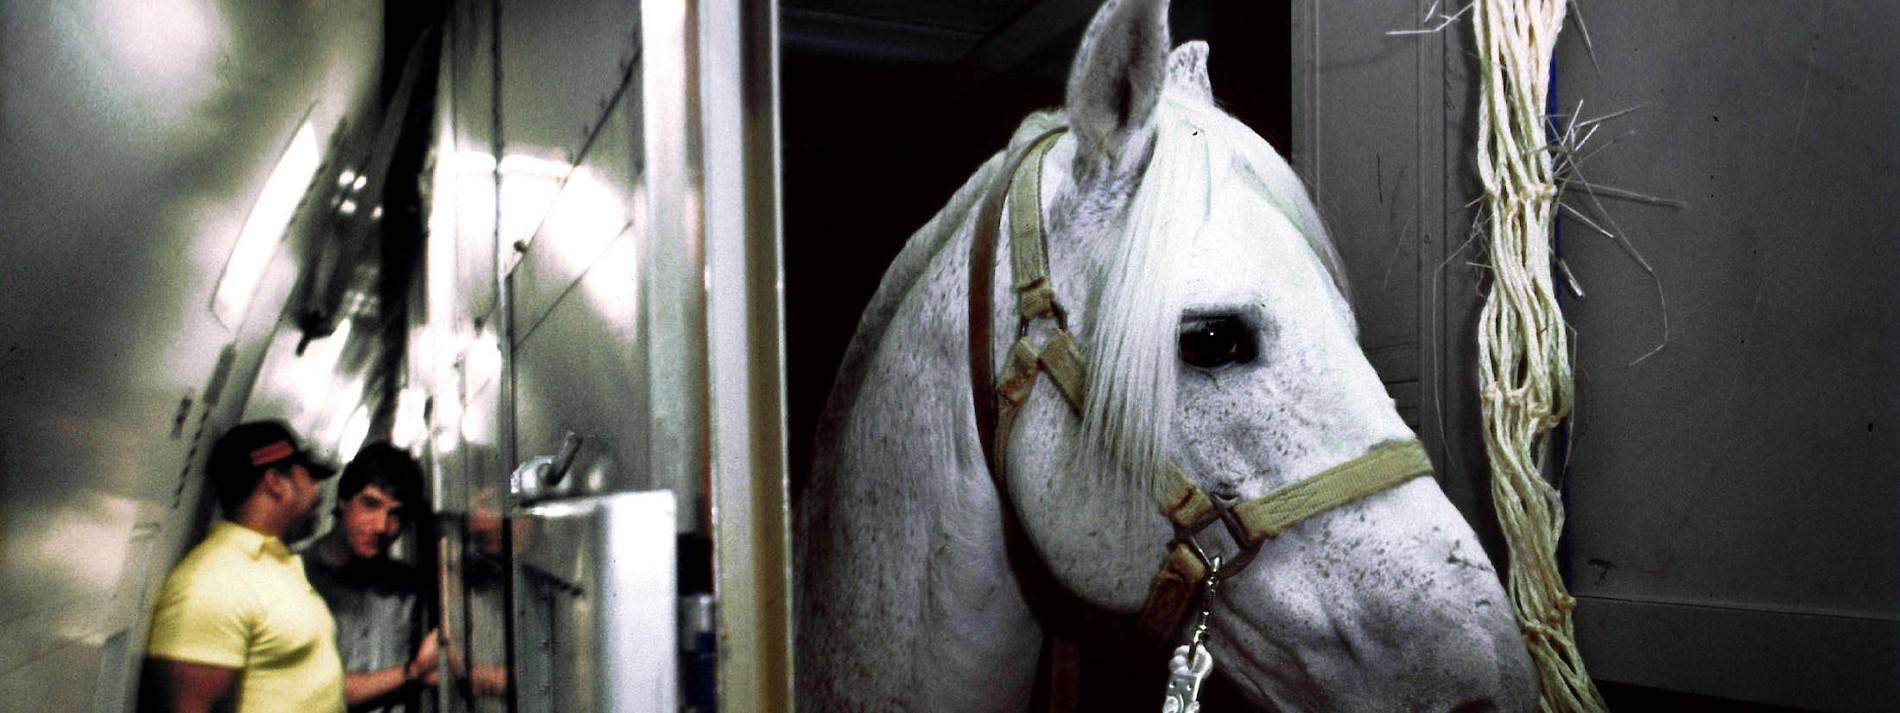 Die Angst vor einer Pferde-Pandemie